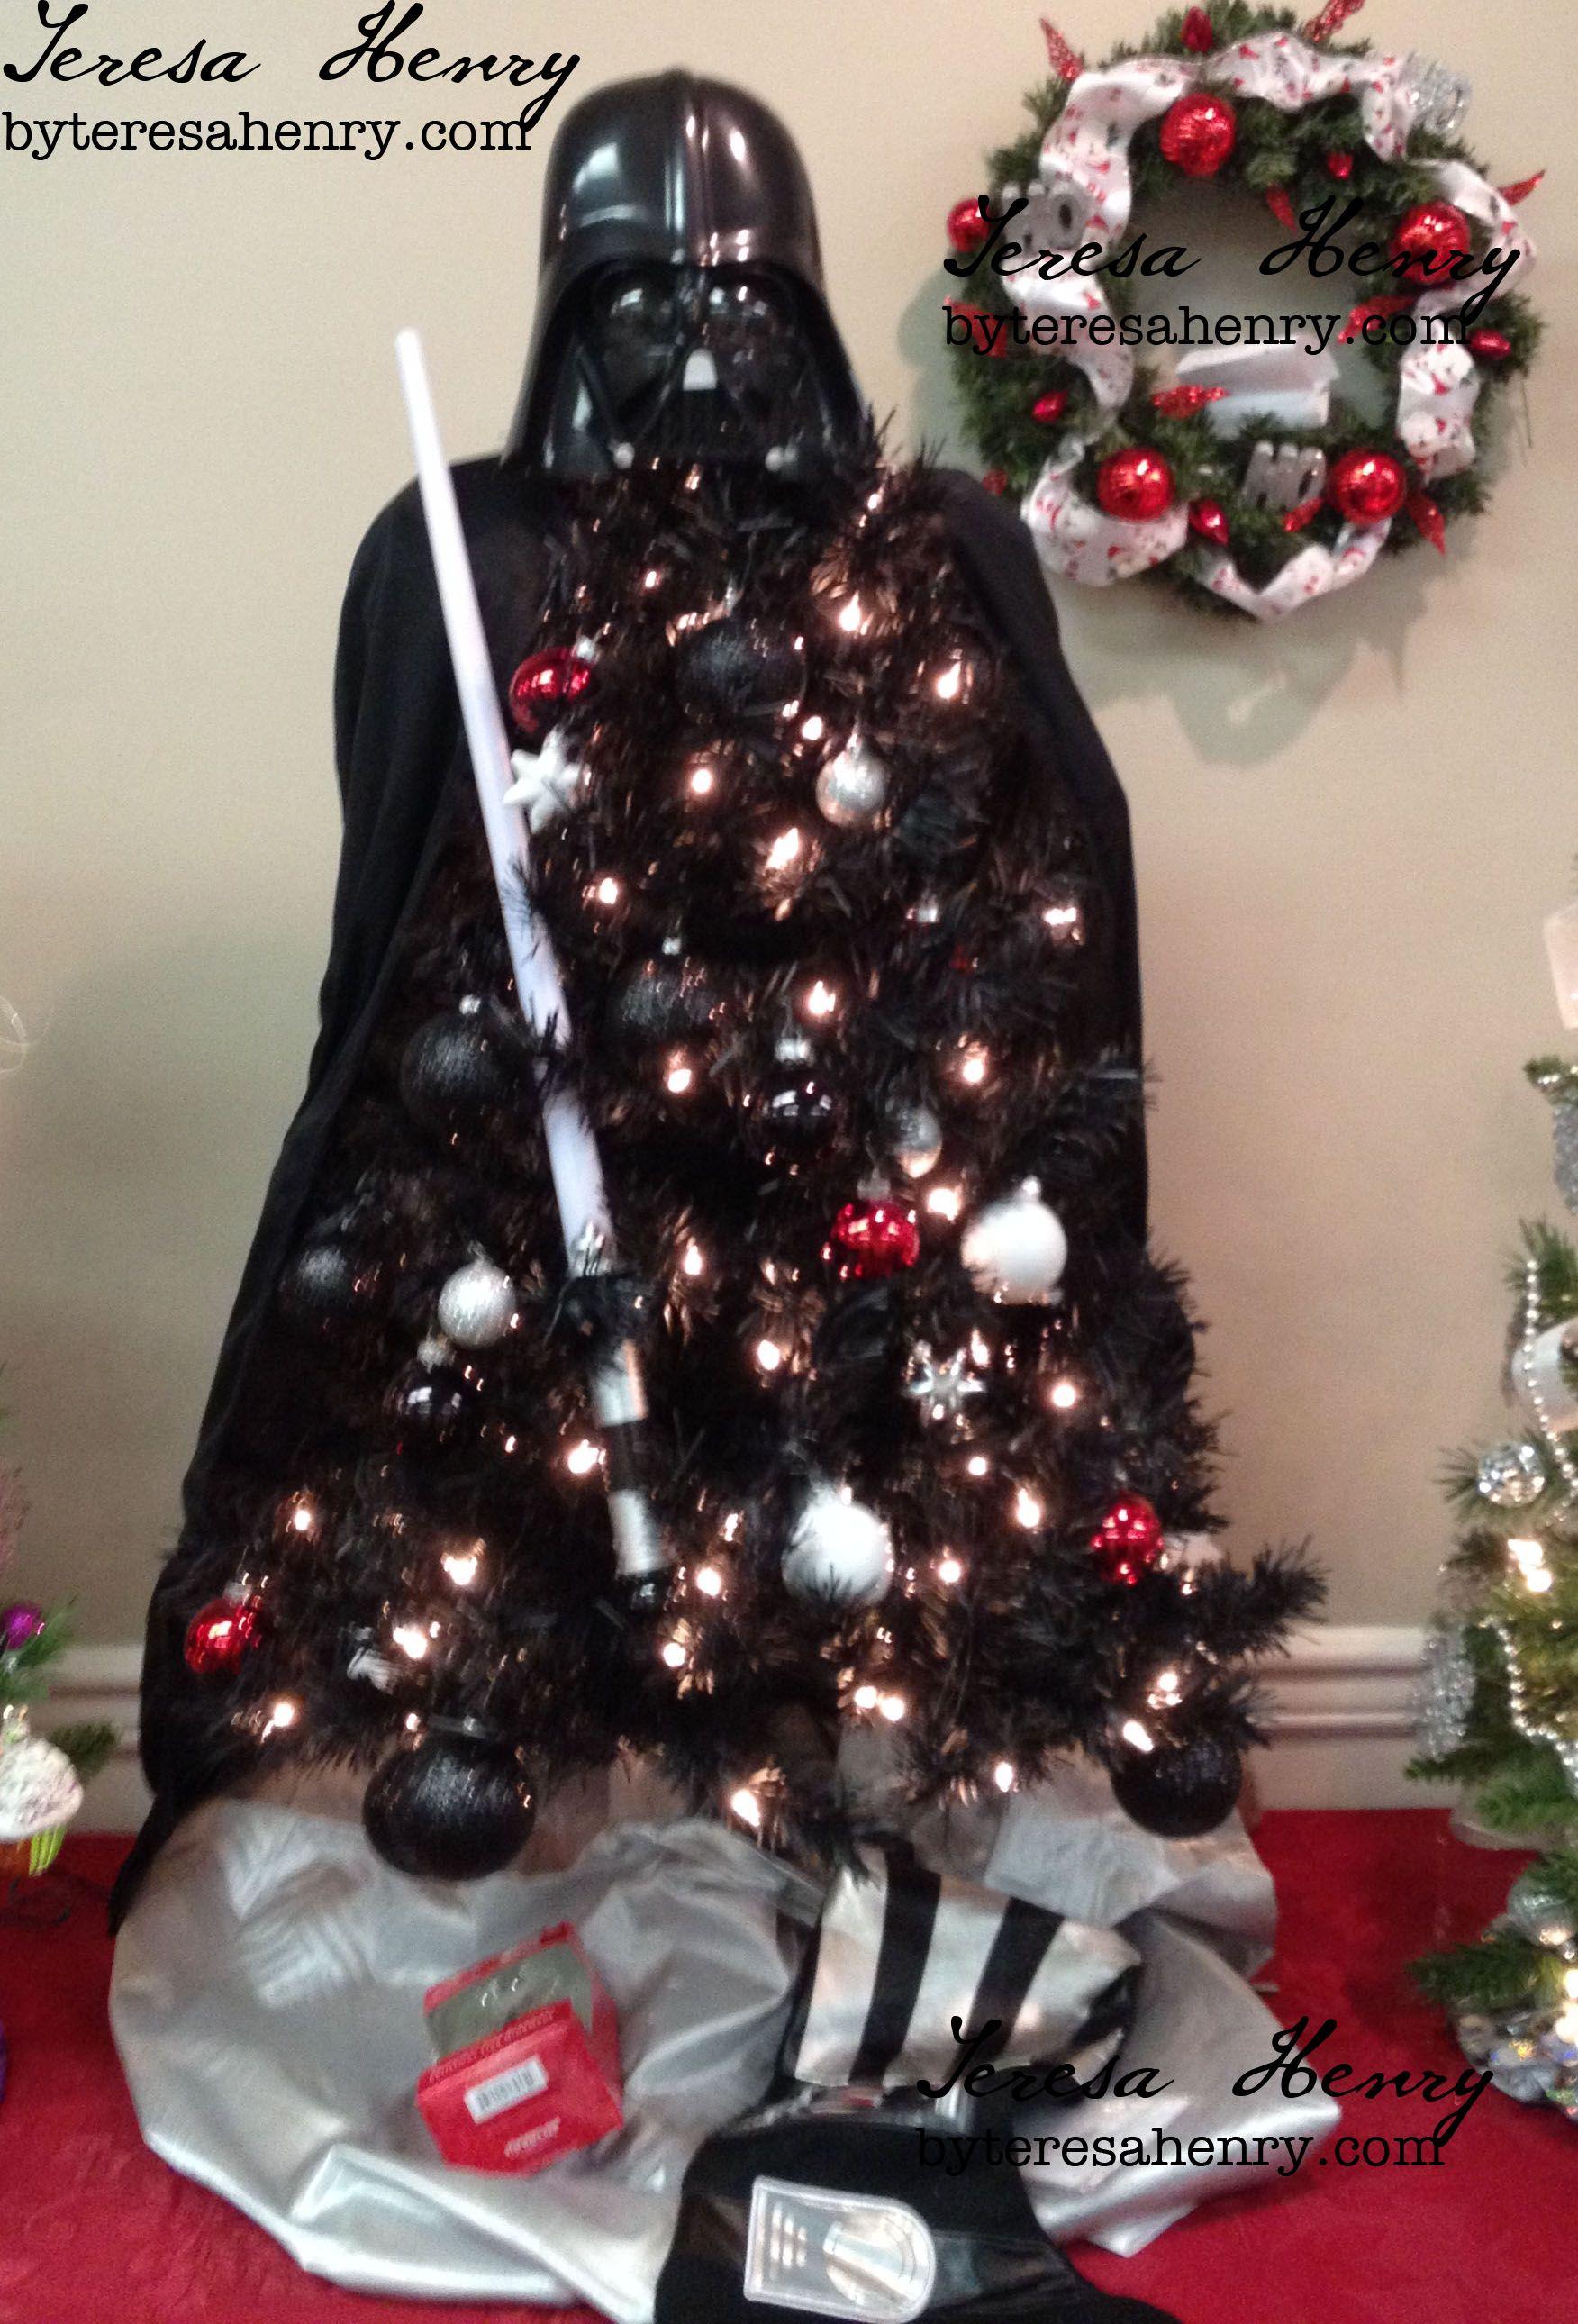 Darth Vader Christmas Tree 2014 - Made for the Blue Ridge Arts ...